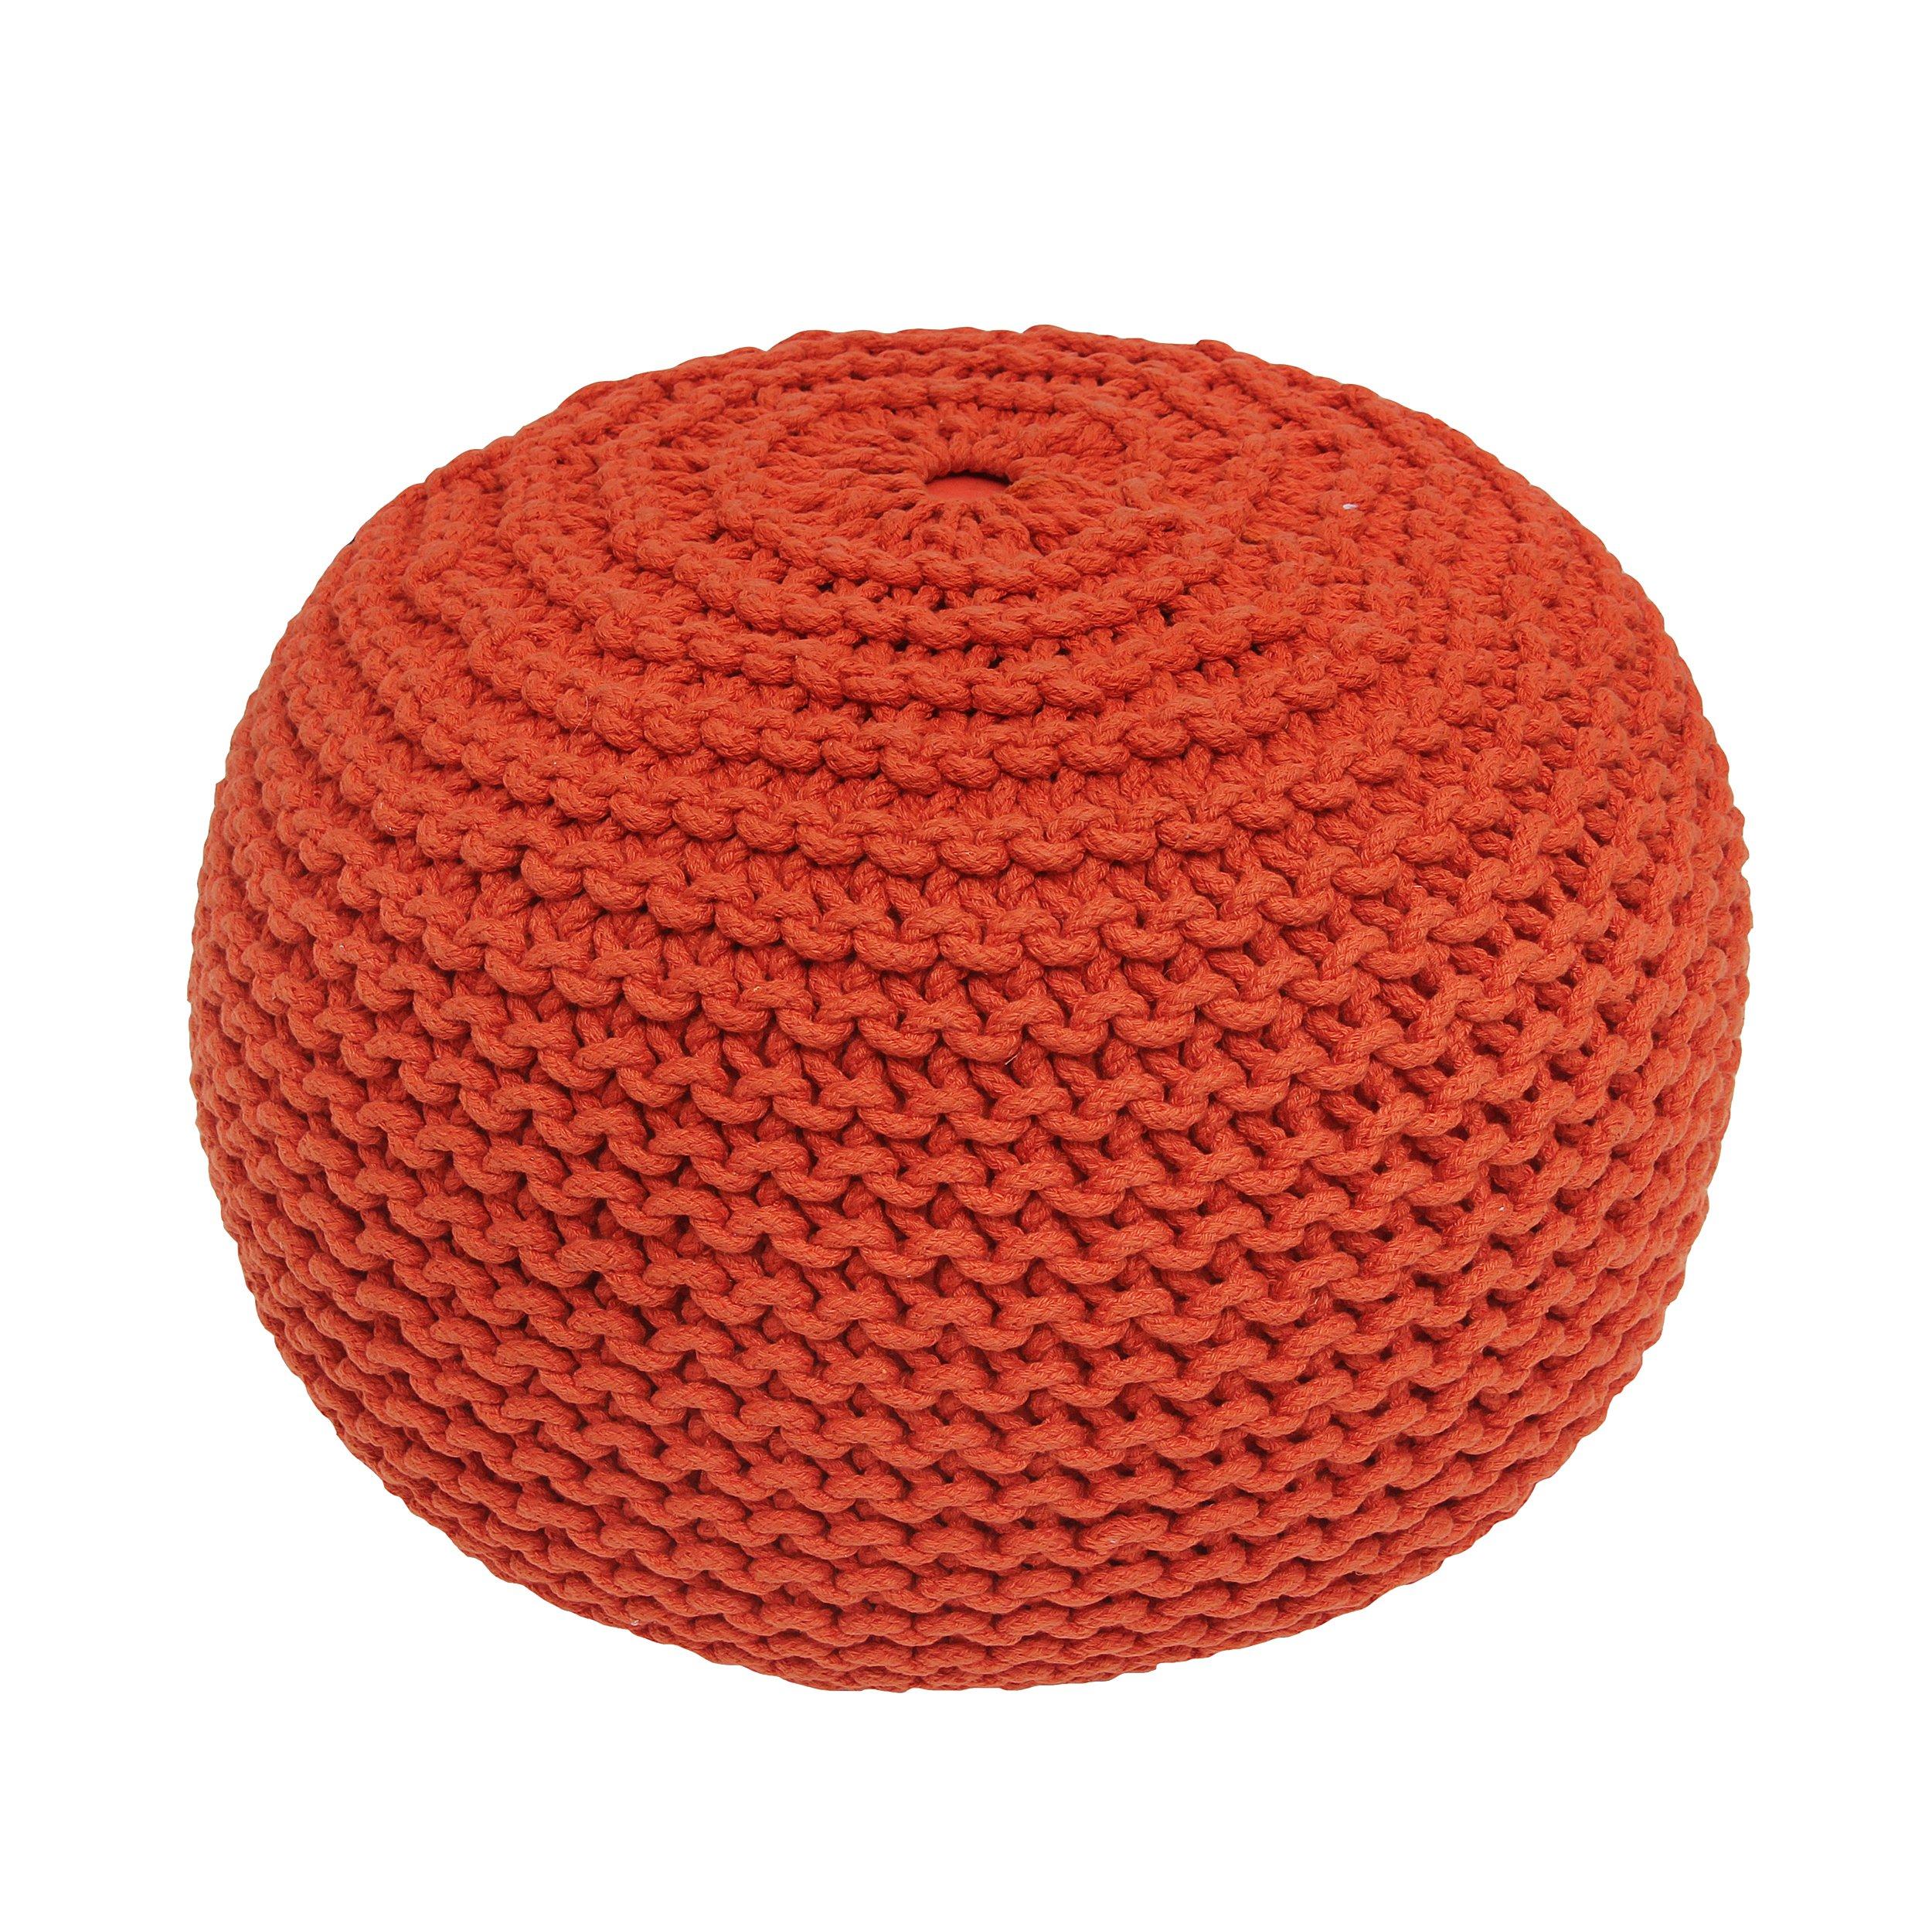 BrandWave Cotton Cover Round Pouf Ottomon/Seat - Elegantly Woven Hand Knit 100 Percent Cotton Cover - Soft Yet Sturdy Design - Orange - 18x18x18 (round)